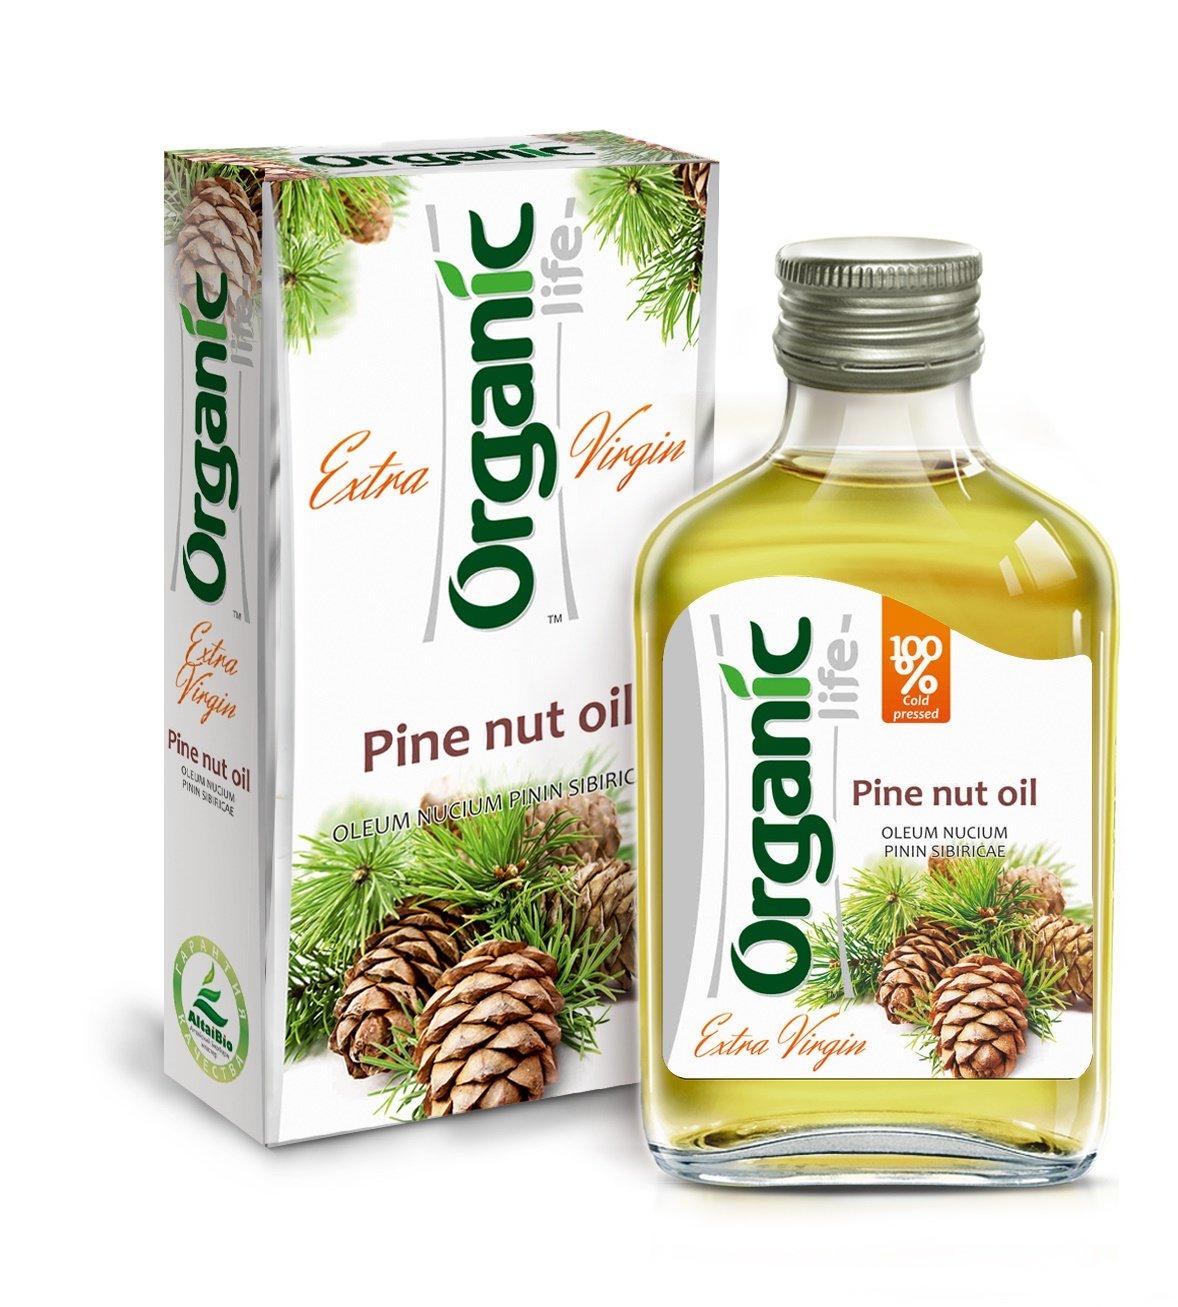 Extra Virgin Siberian Pine Nut Oil 3.4 fl oz/100 ml Organic Cold Pressed Unrefined Raw No GMO